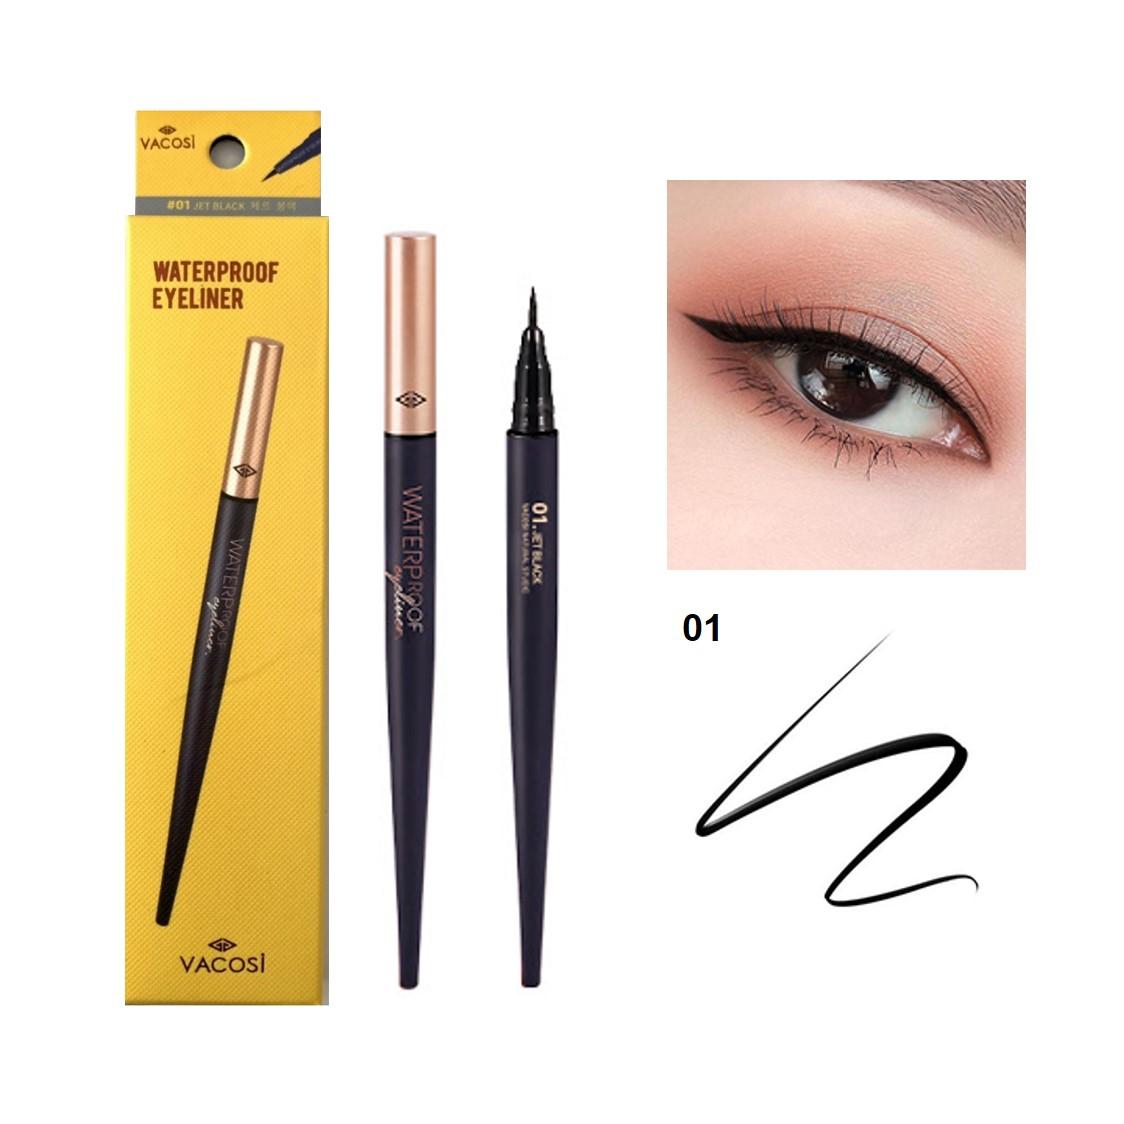 Bút Kẻ Mắt Nước Siêu Lì Vacosi Natutal Studio Waterproof Eyeliner [VM24]